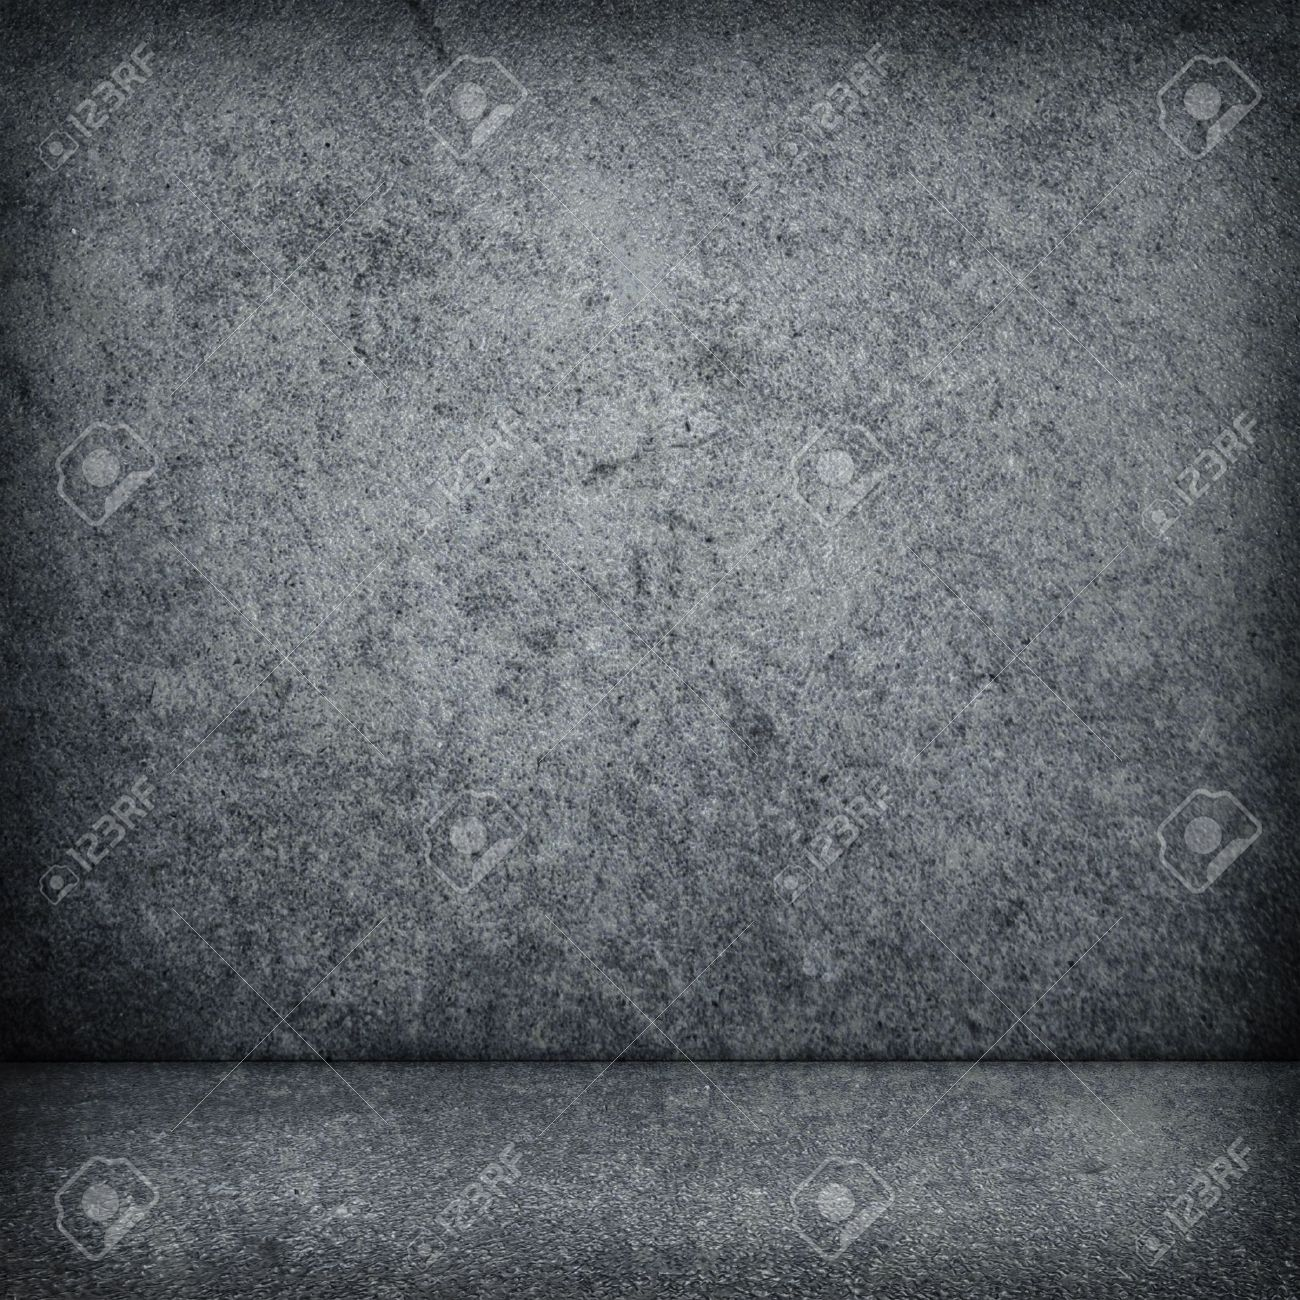 Dark Concrete Floor Texture 1057;oncrete wall large concrete wall texture background .. stock